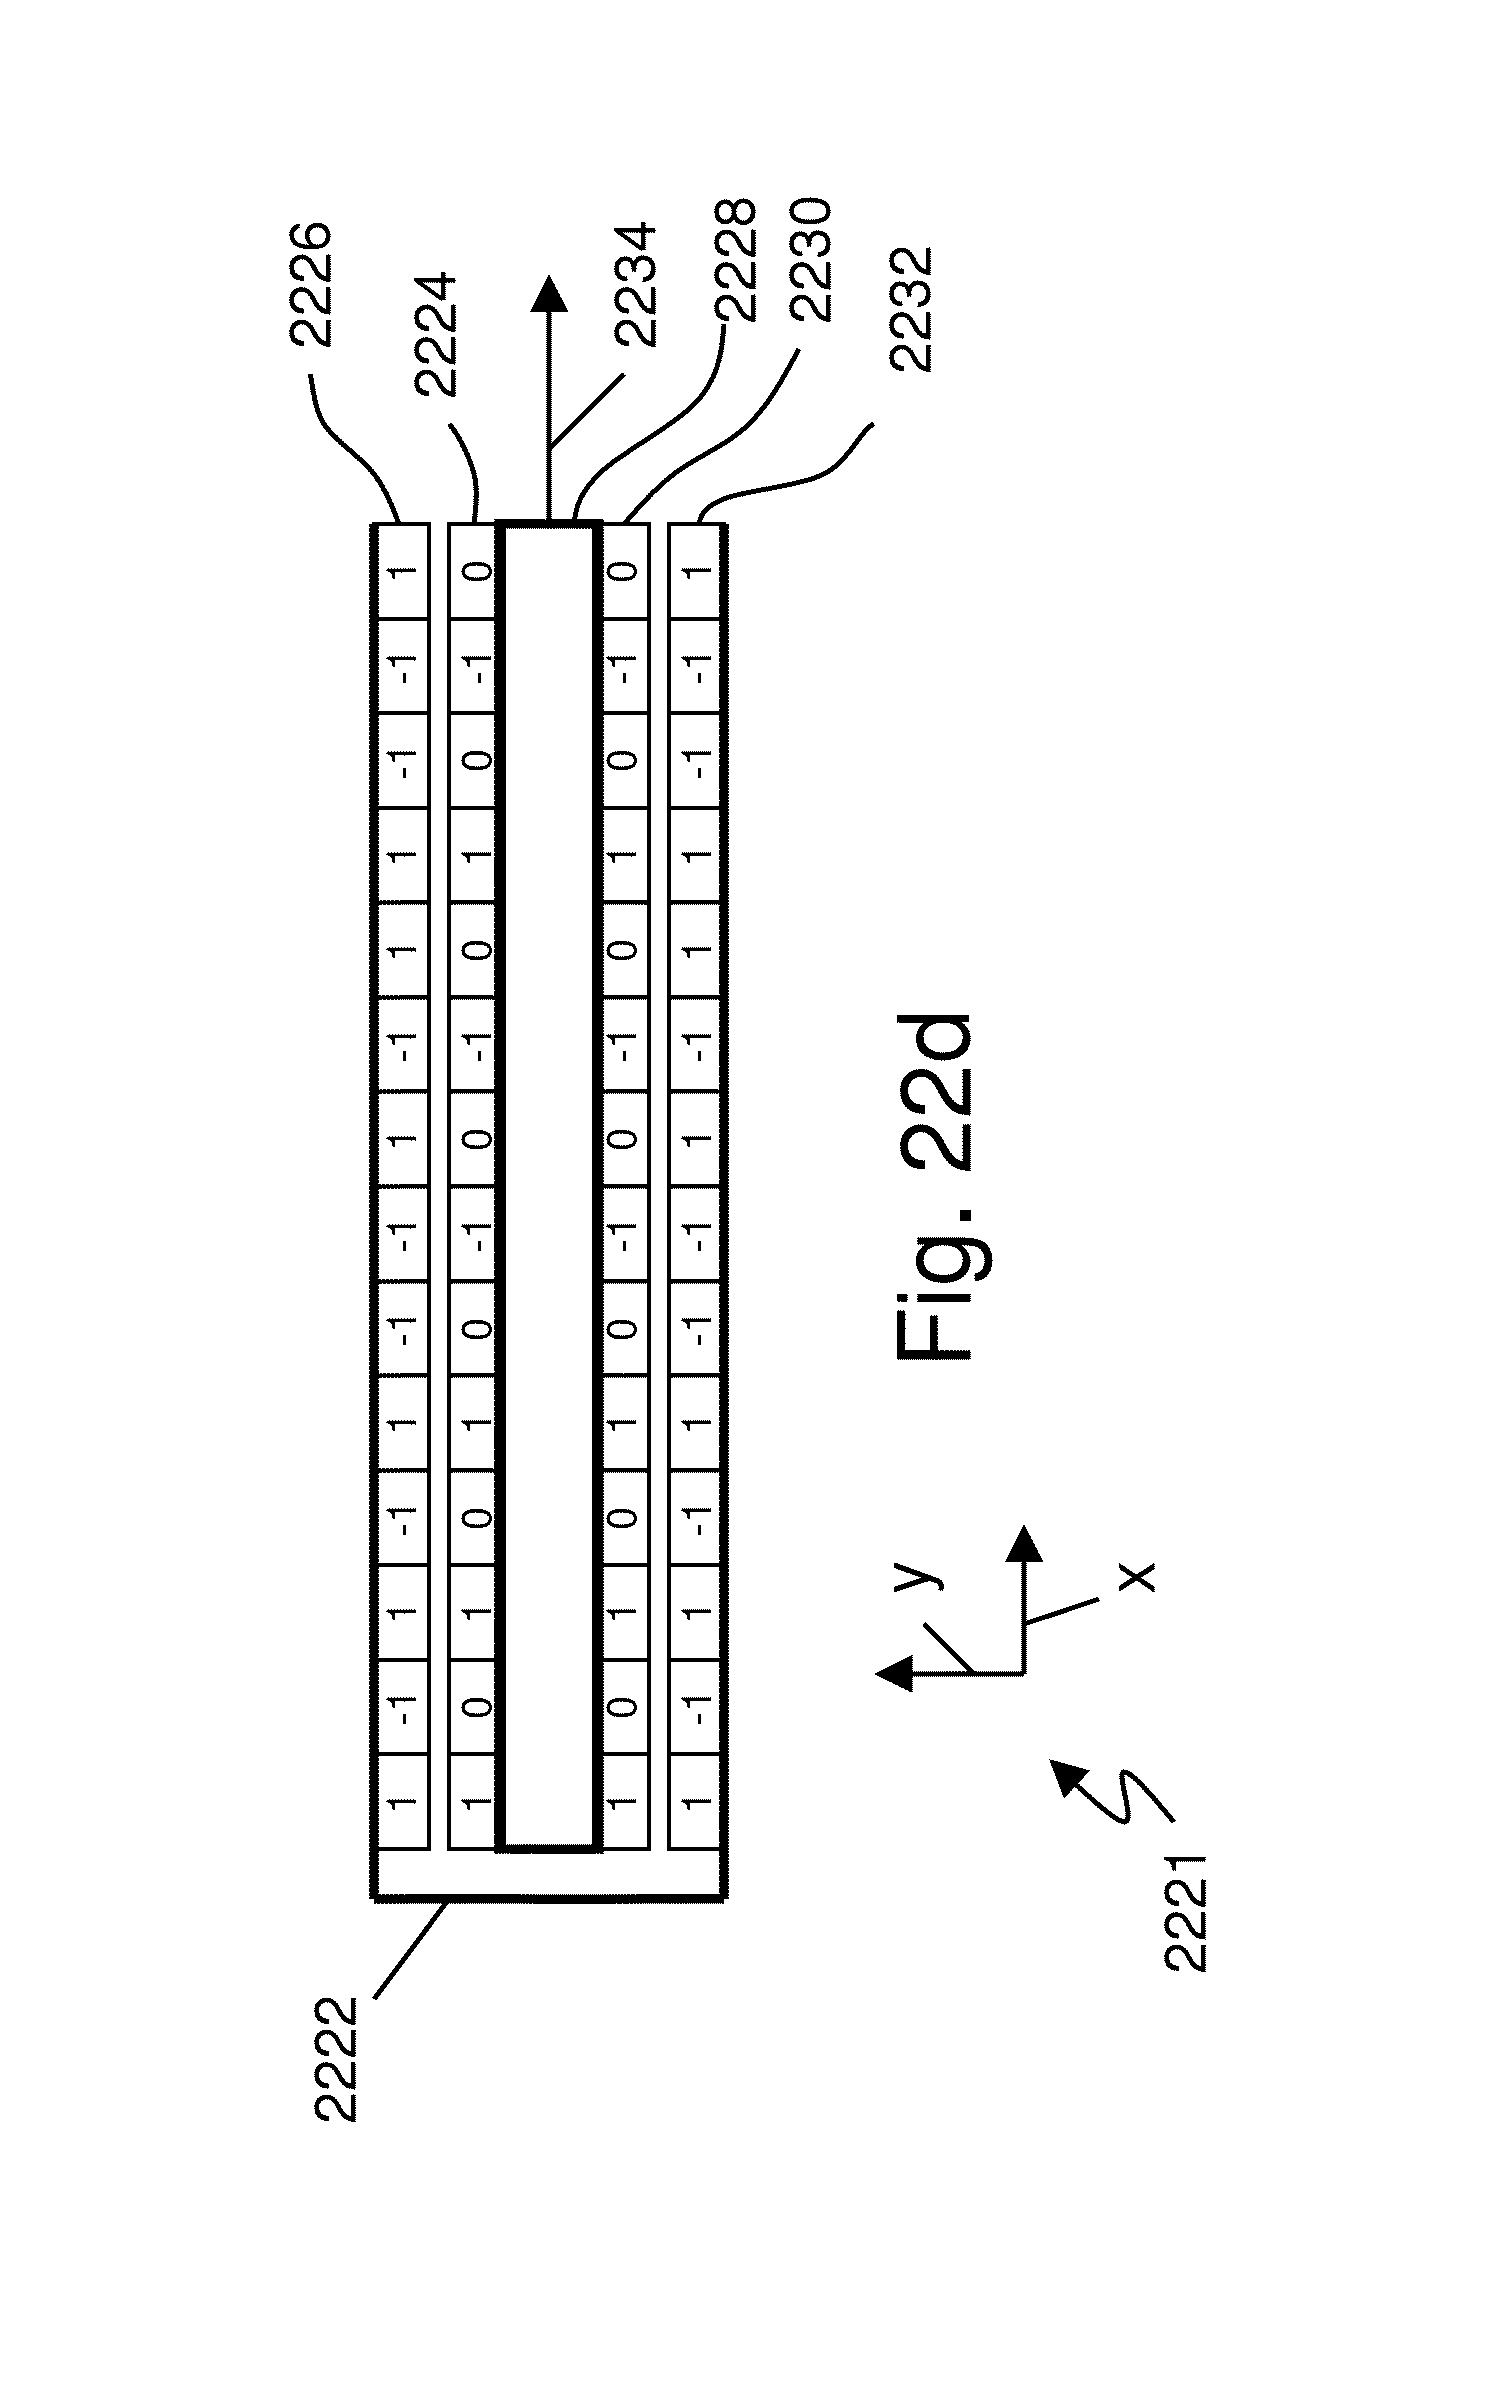 Magnetic Sensor Symbol Within Power Supply Symbol